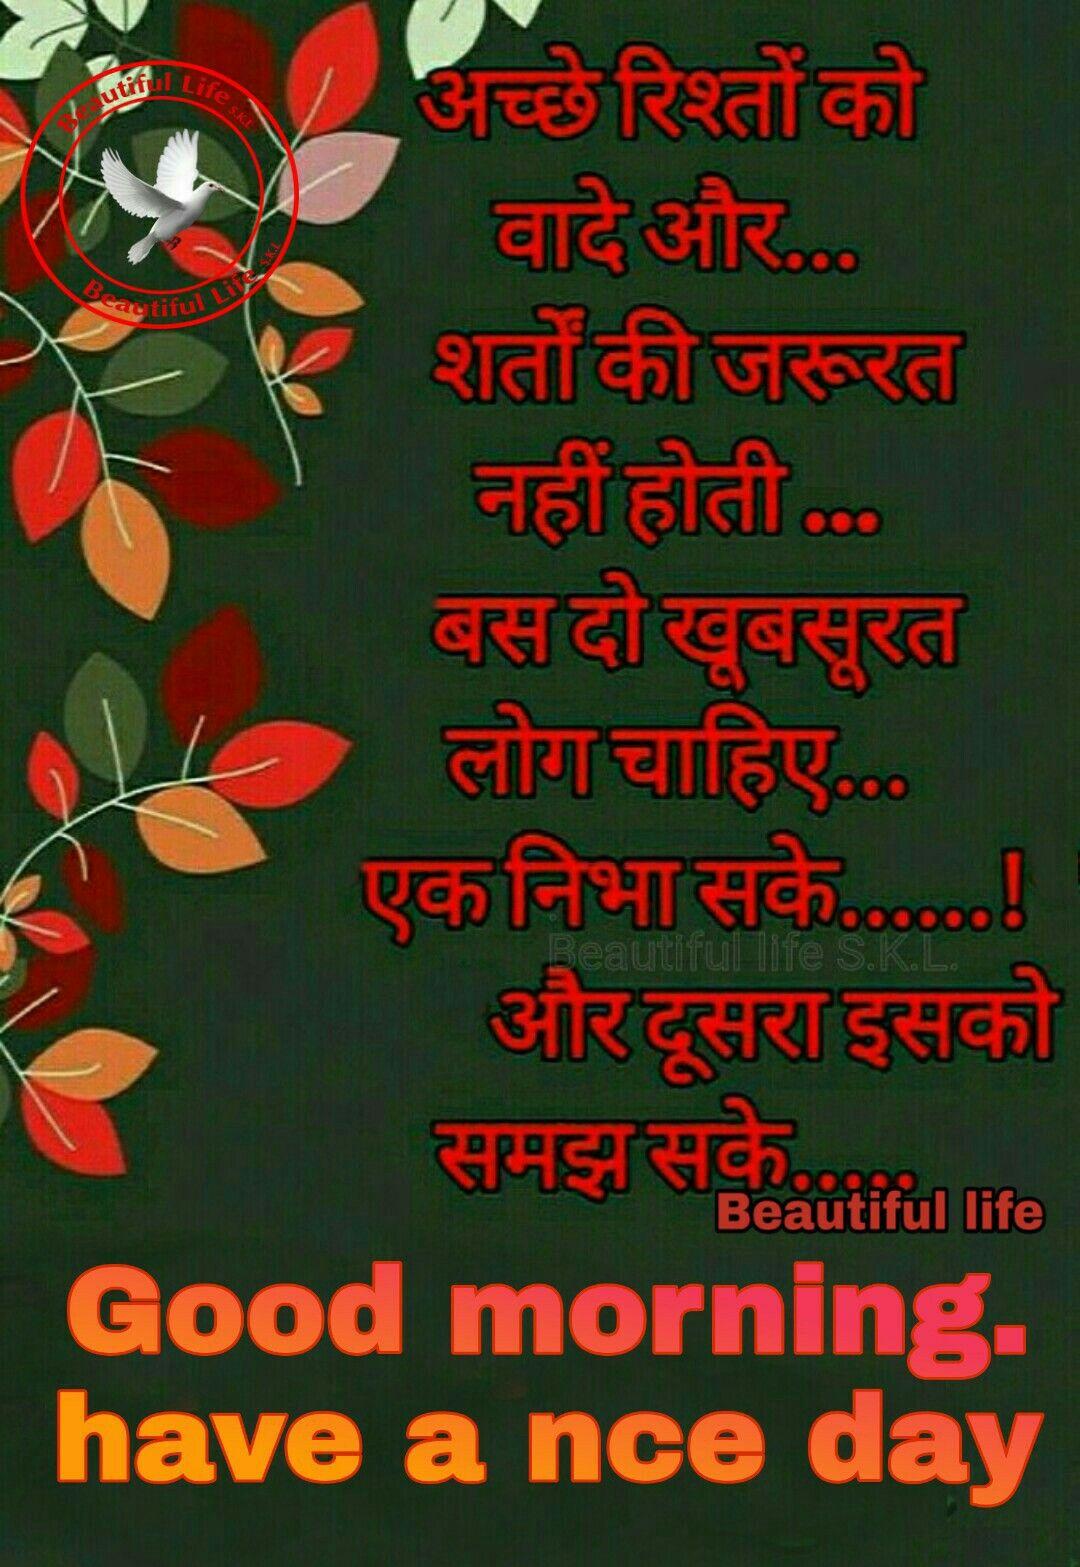 Pin By Gopesh Avasthi On Morning Morning Quotes Inspiring